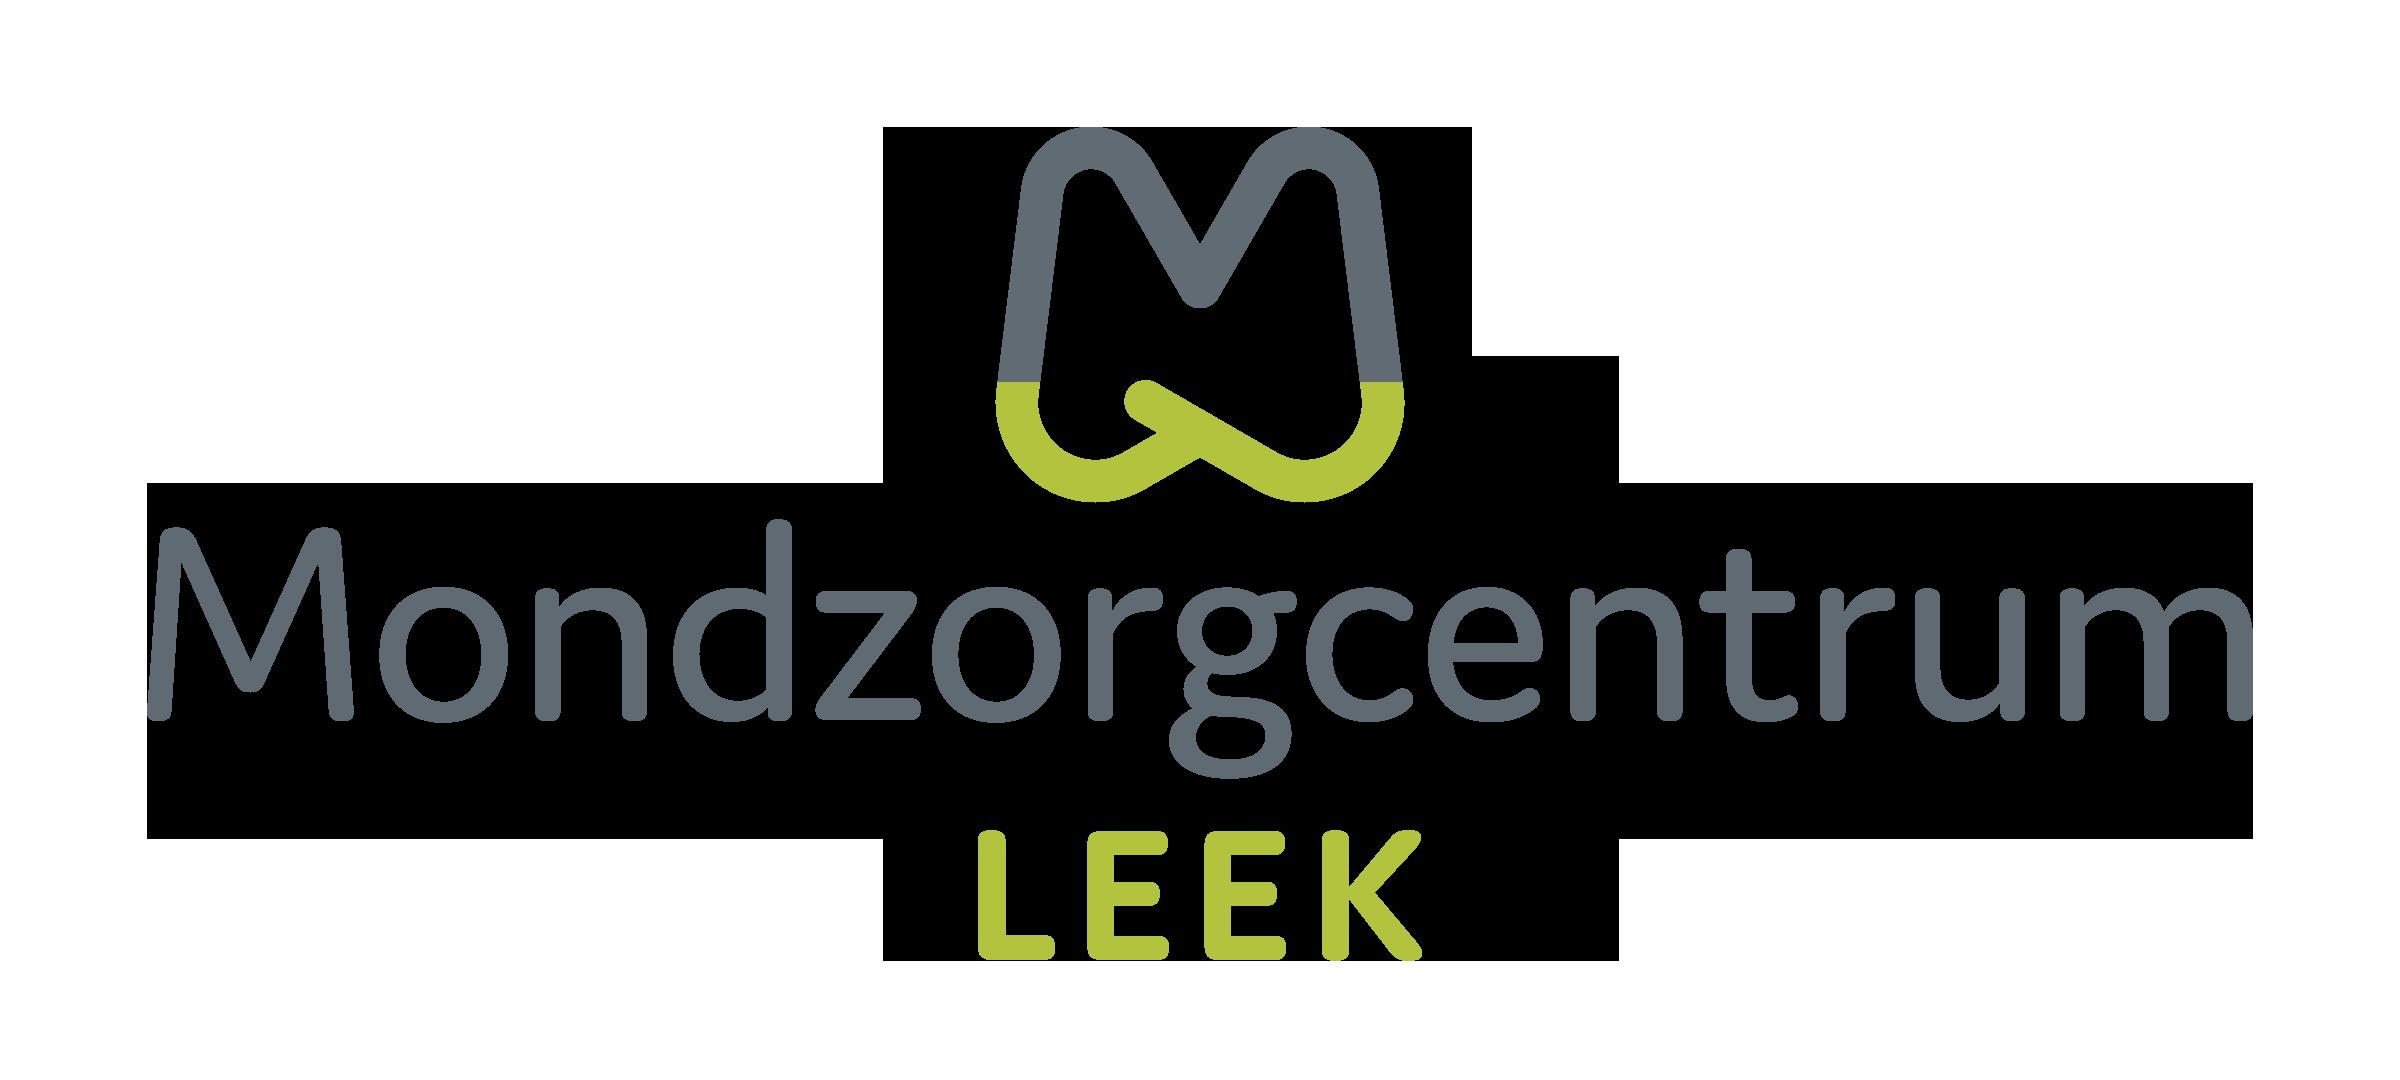 mondzorgleek.nl